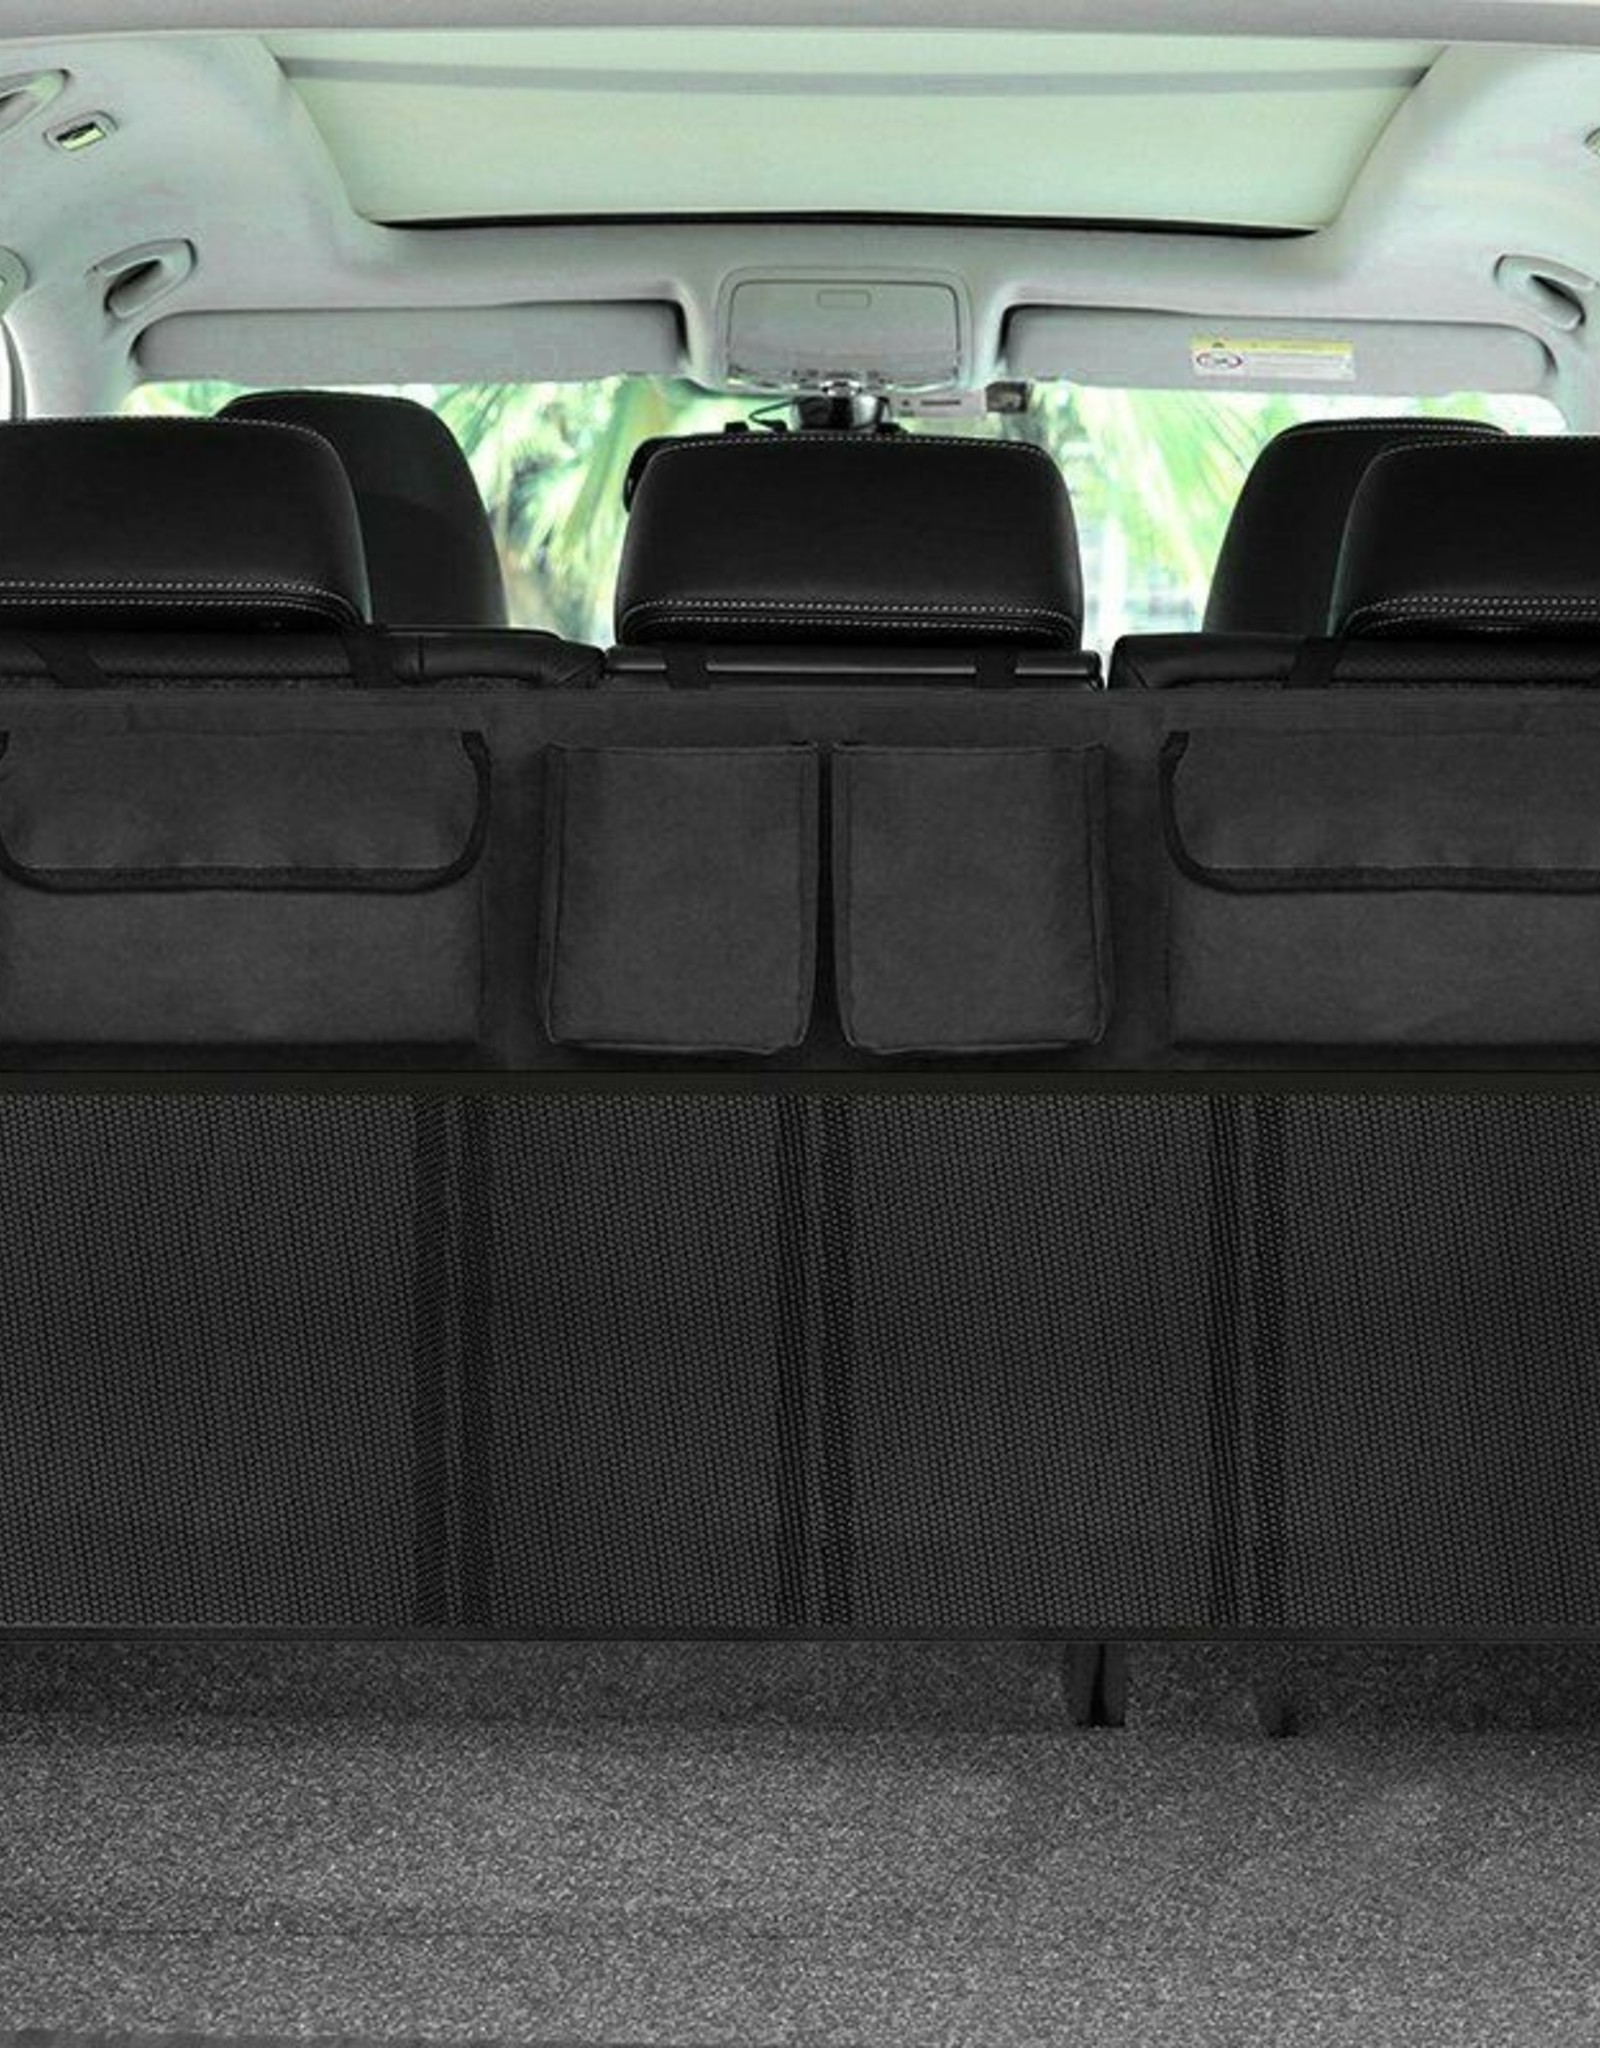 Kofferbakorganizer met acht vakken